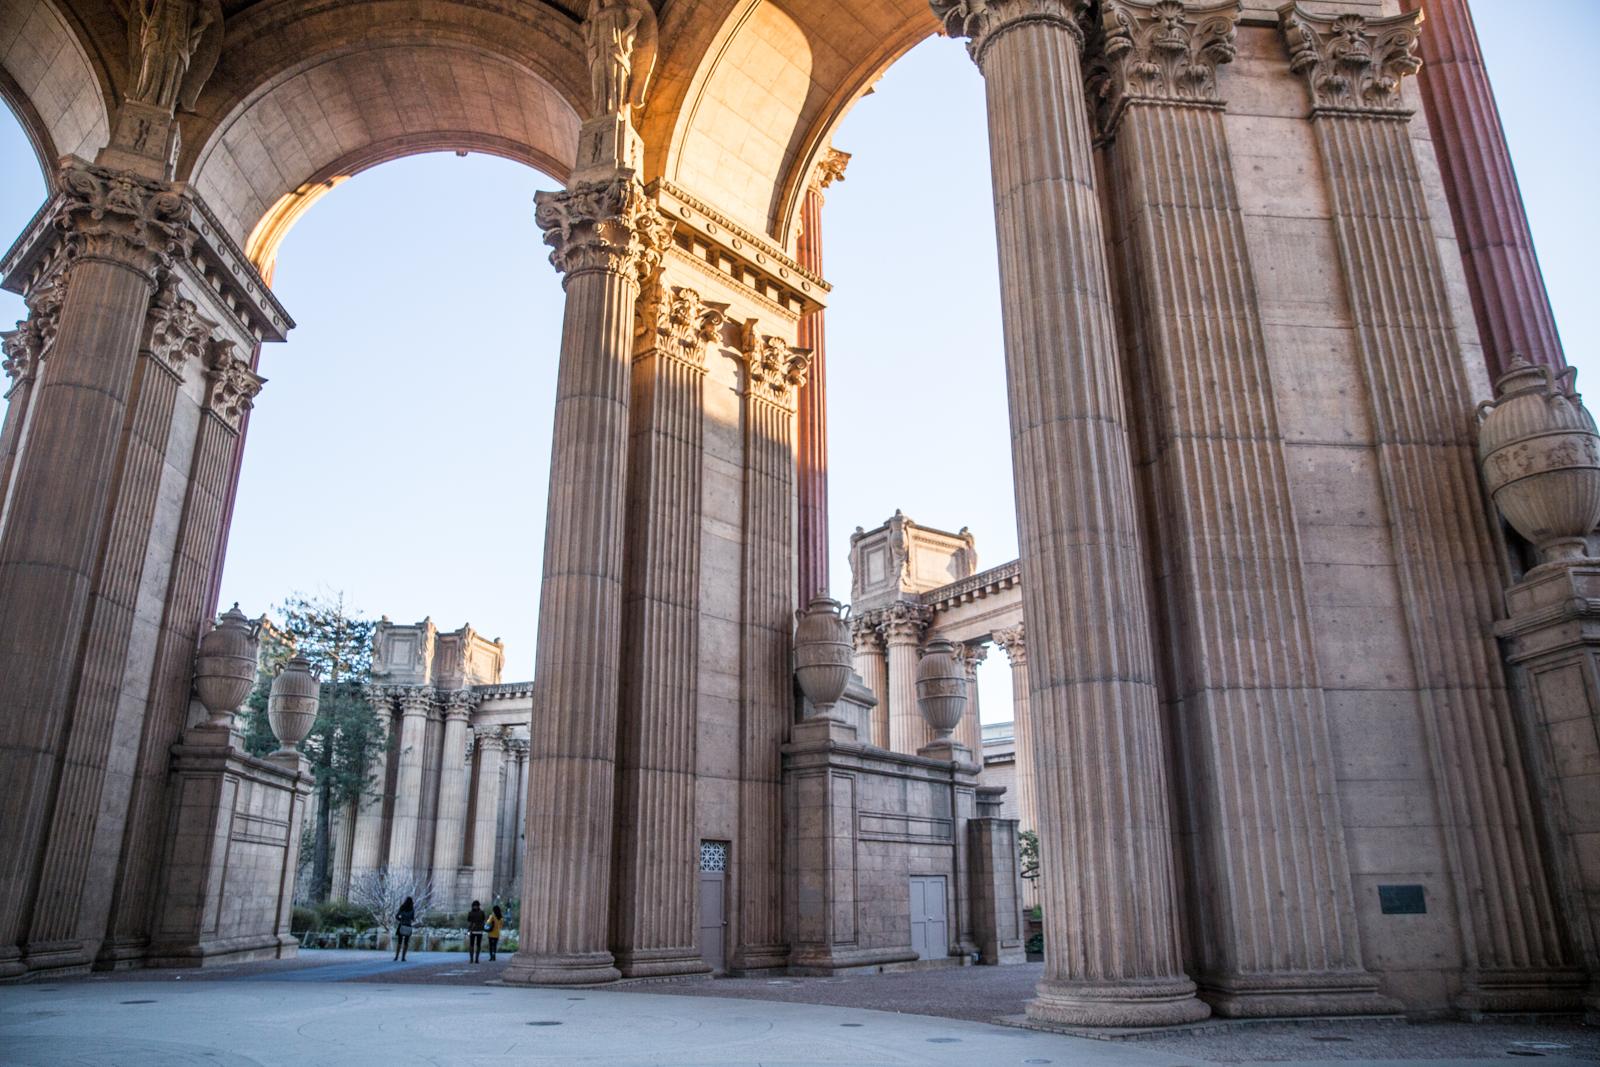 palace of fine arts san francisco-9400